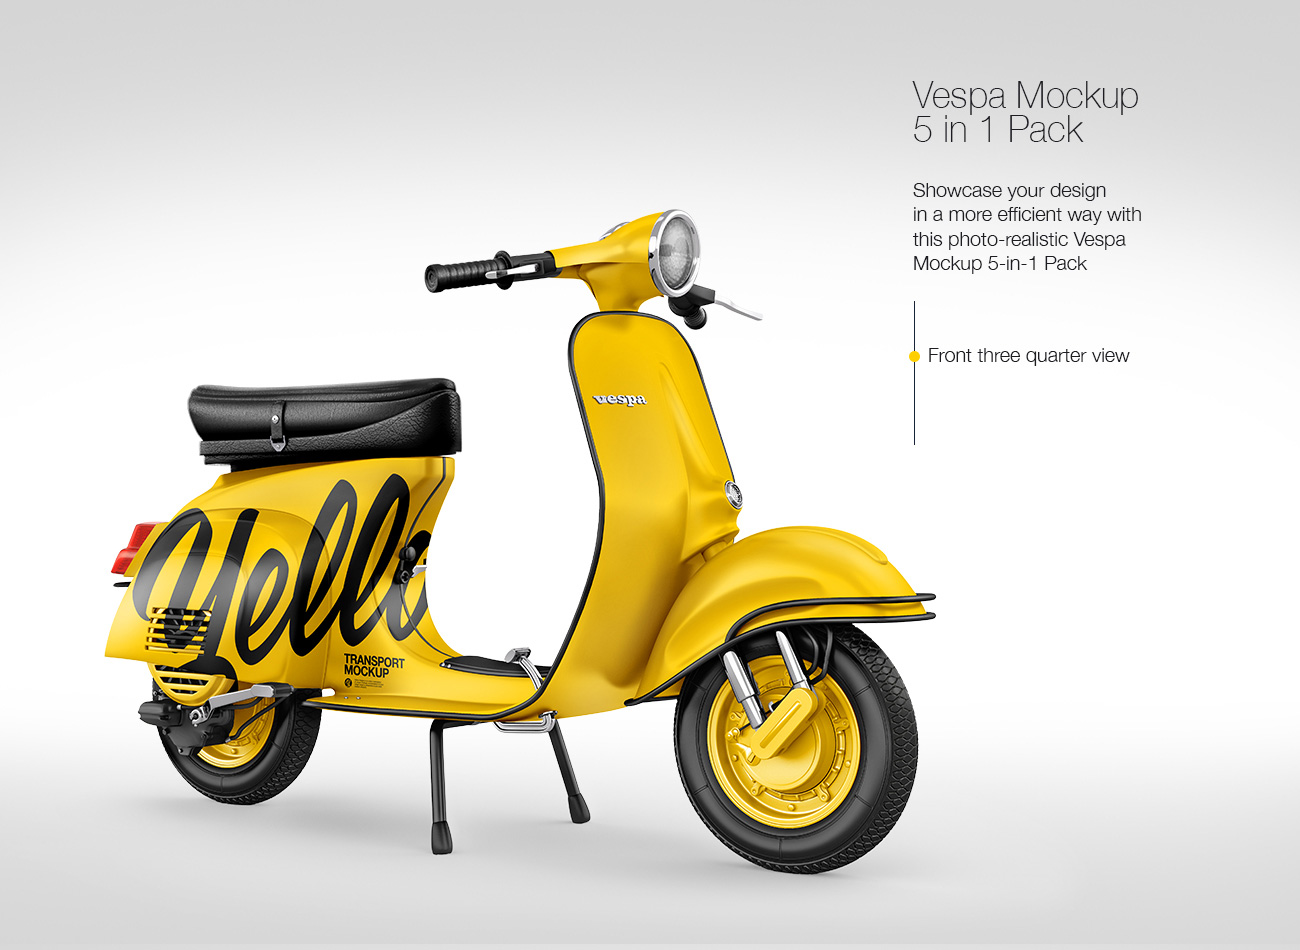 Vespa Scooter Mockup Pack: 5-in-1 Pack